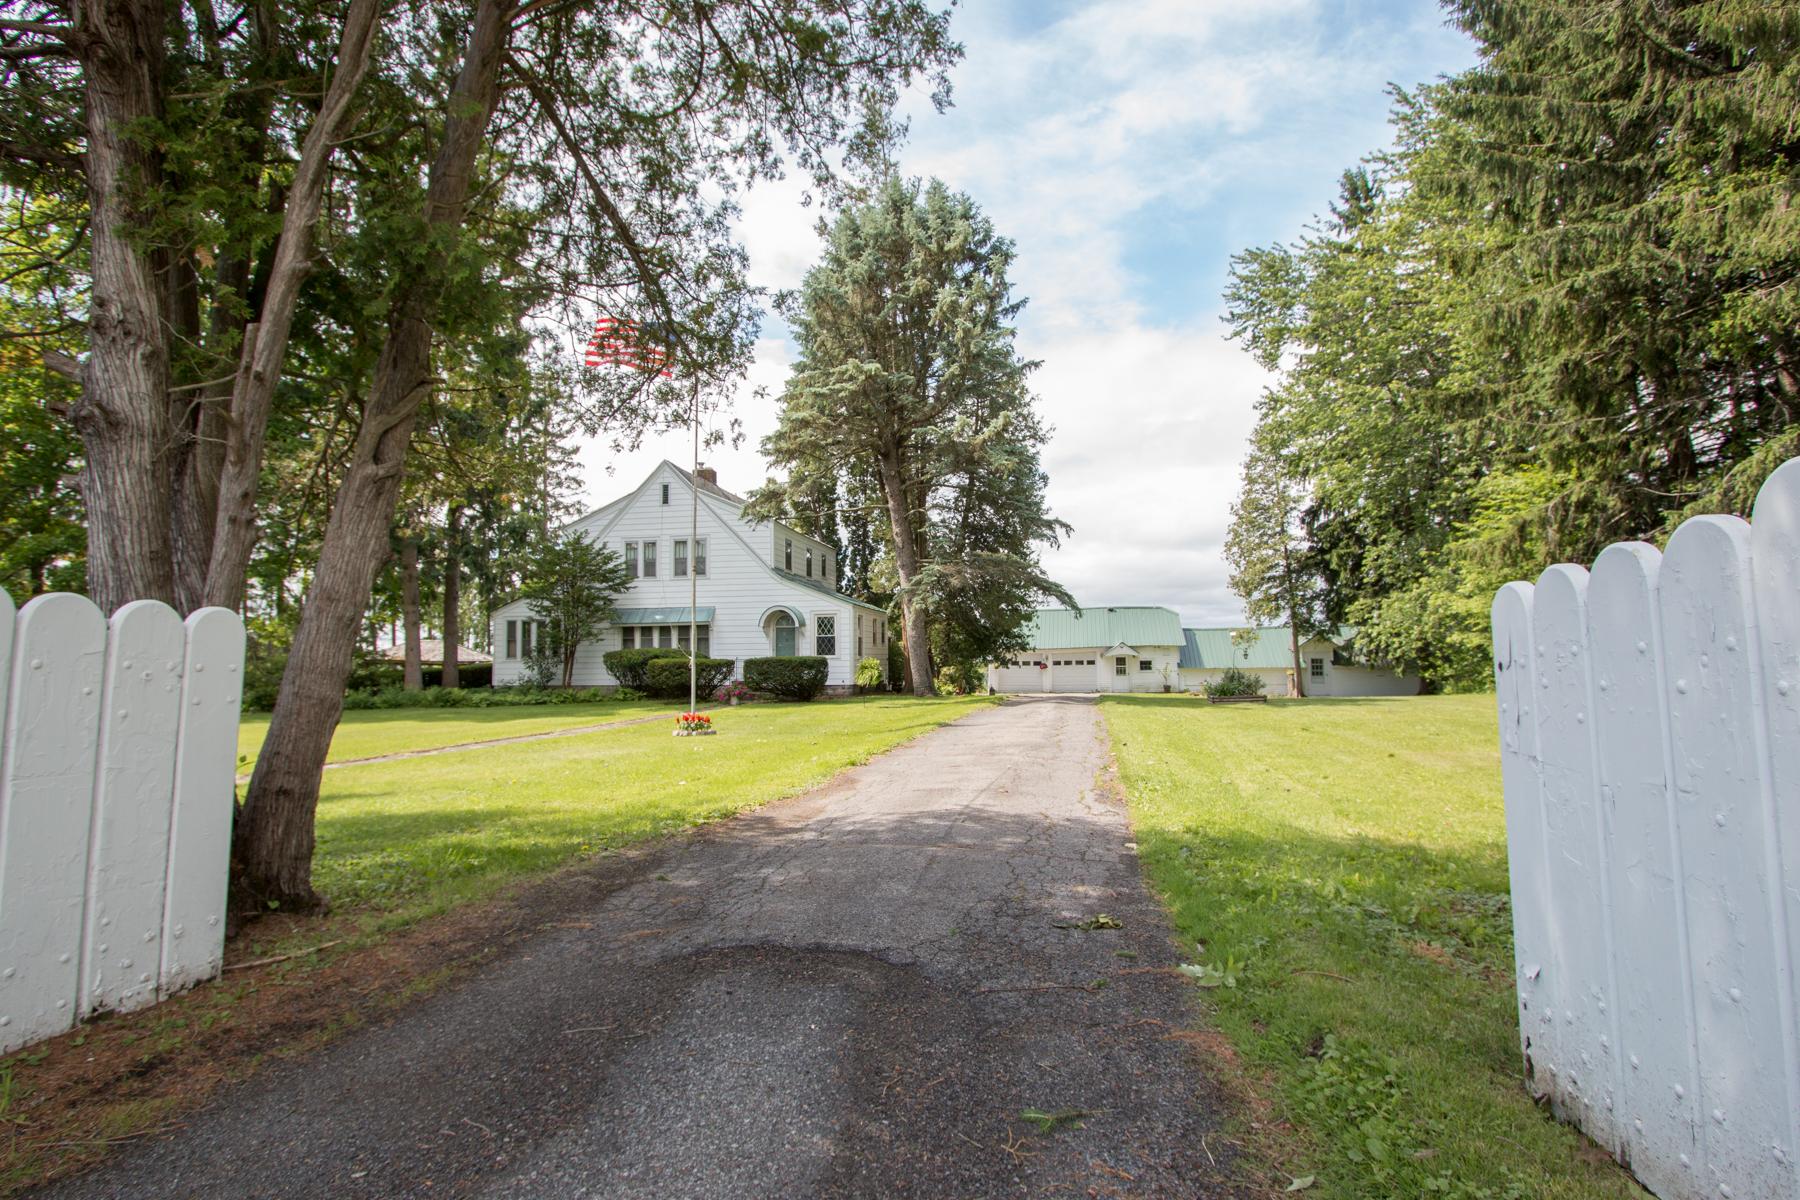 独户住宅 为 销售 在 Scenic Sprawling Country Estate with Views 2820 State Highway 67 Johnstown, 纽约州 12095 美国